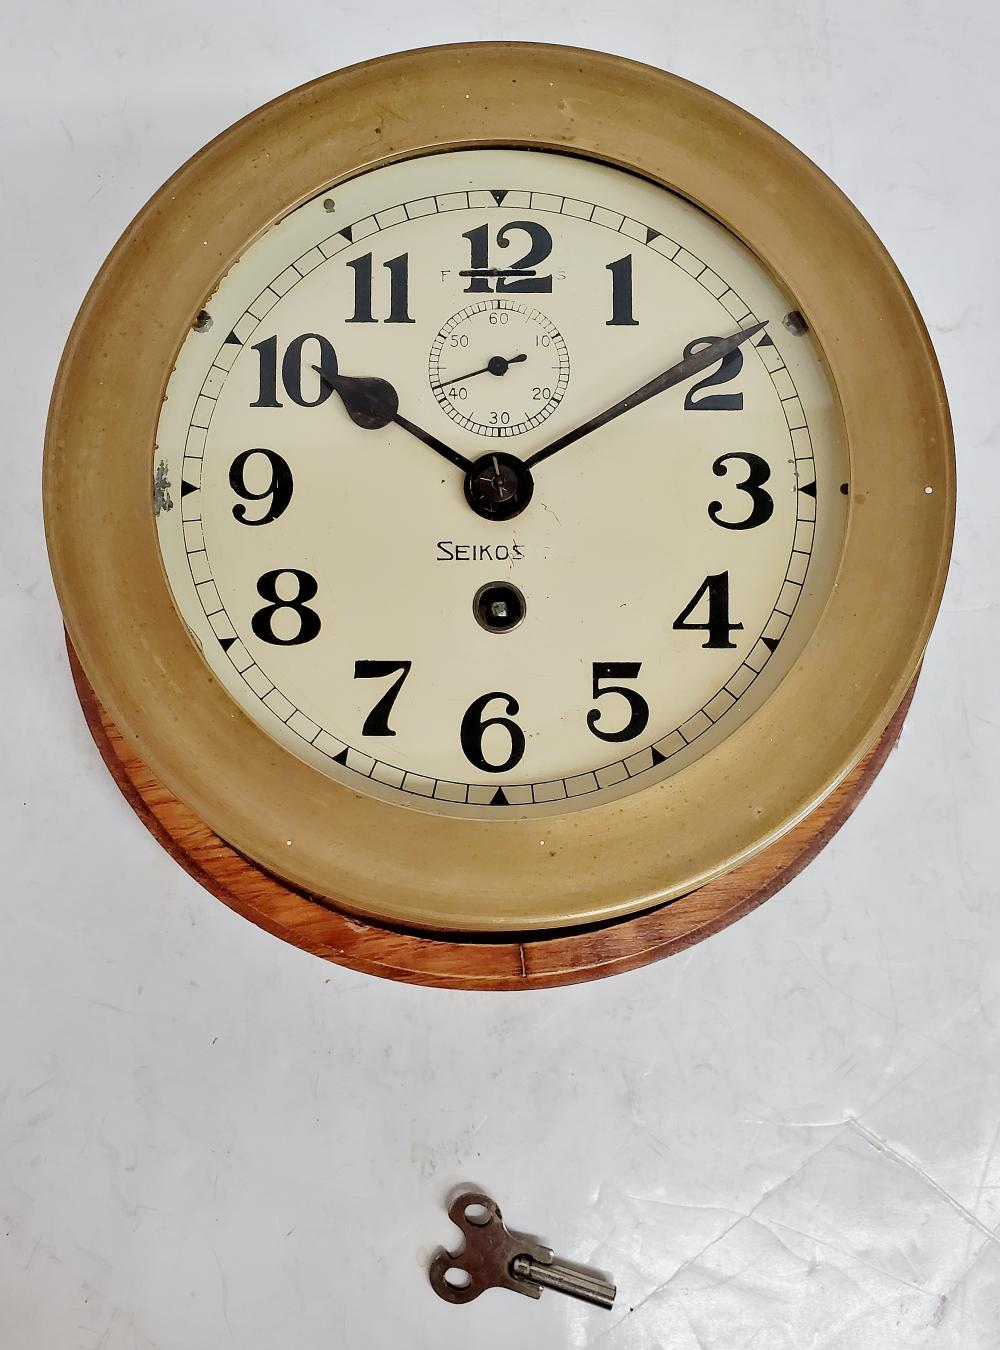 Vintage Brass Seikosha Ships Clock With Wooden Base